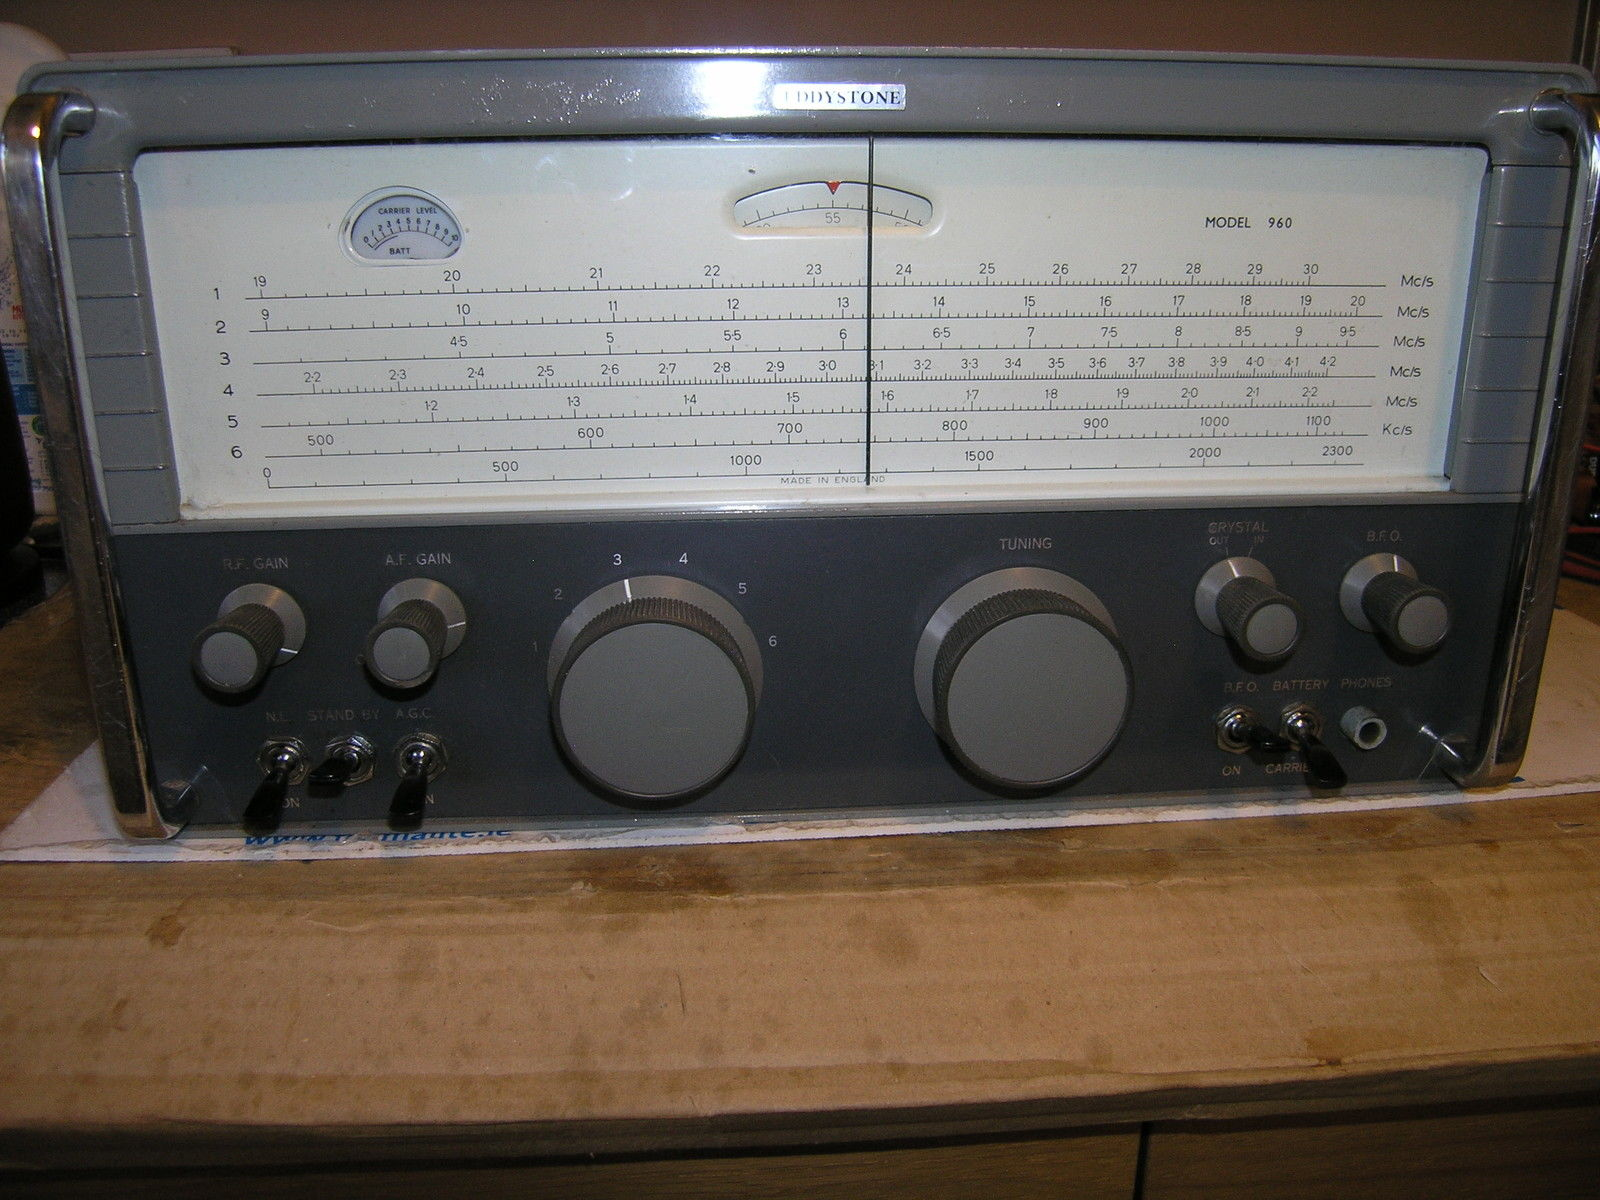 Eddystone 960 set